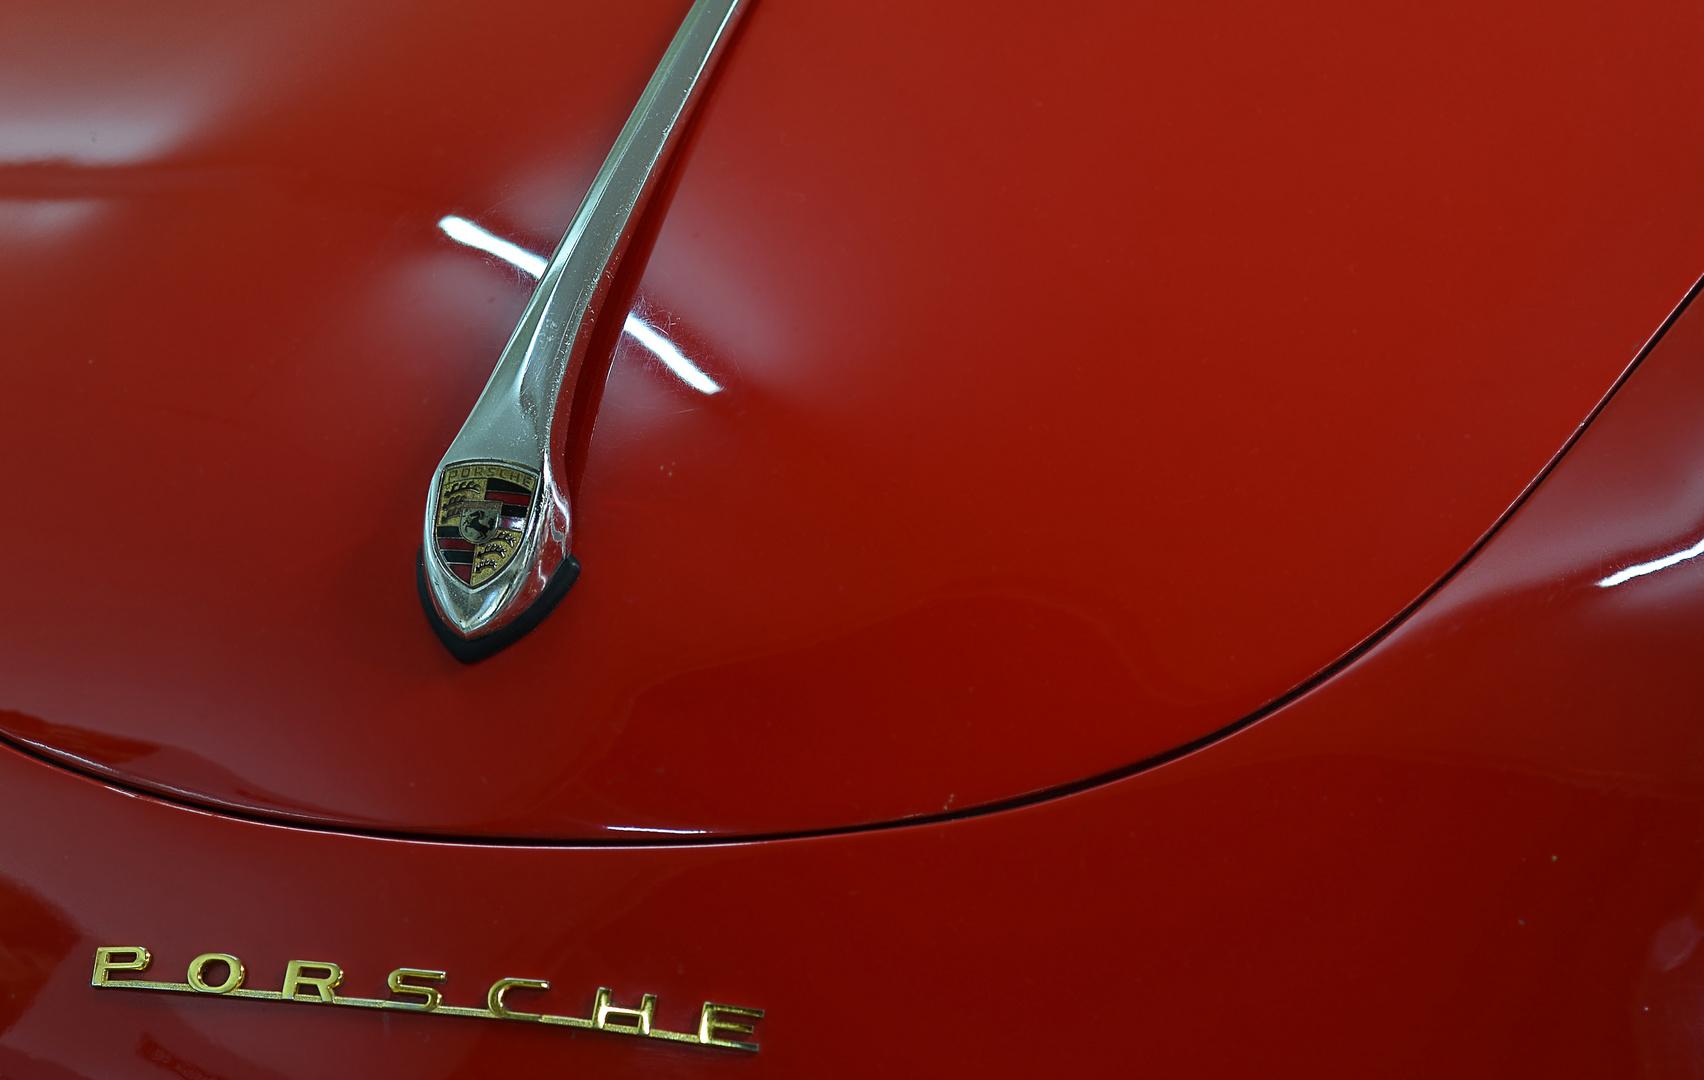 ...my friends all drive Porsches ...